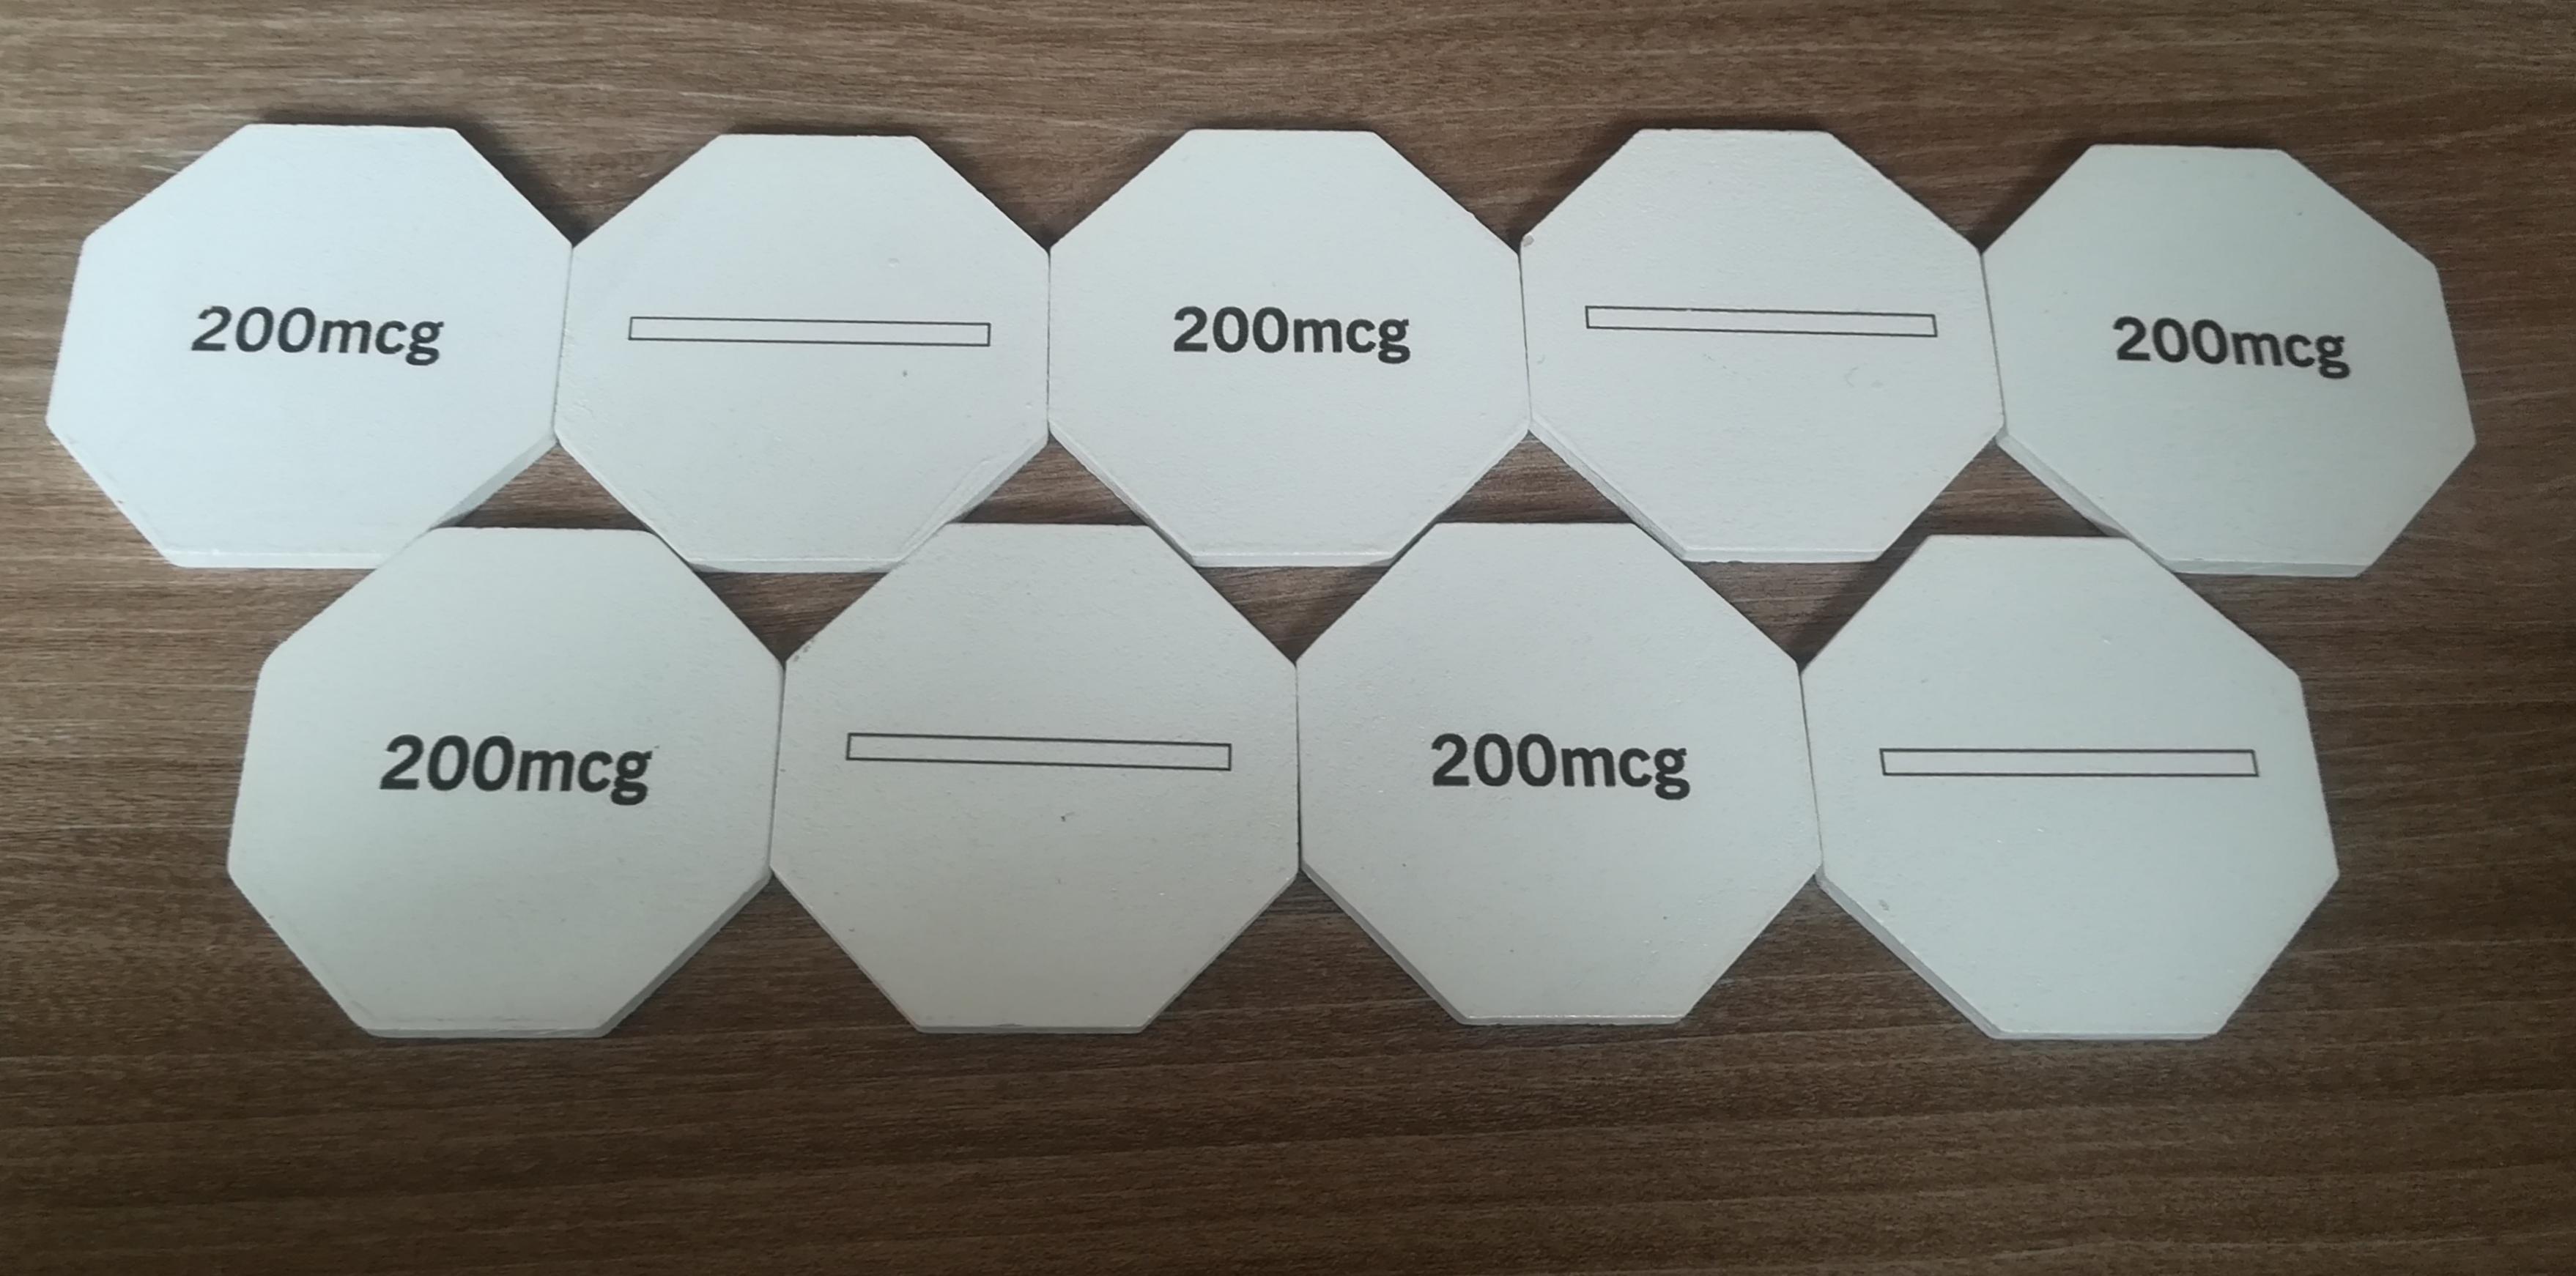 Misoprostol Abortion pills in Bolivia.